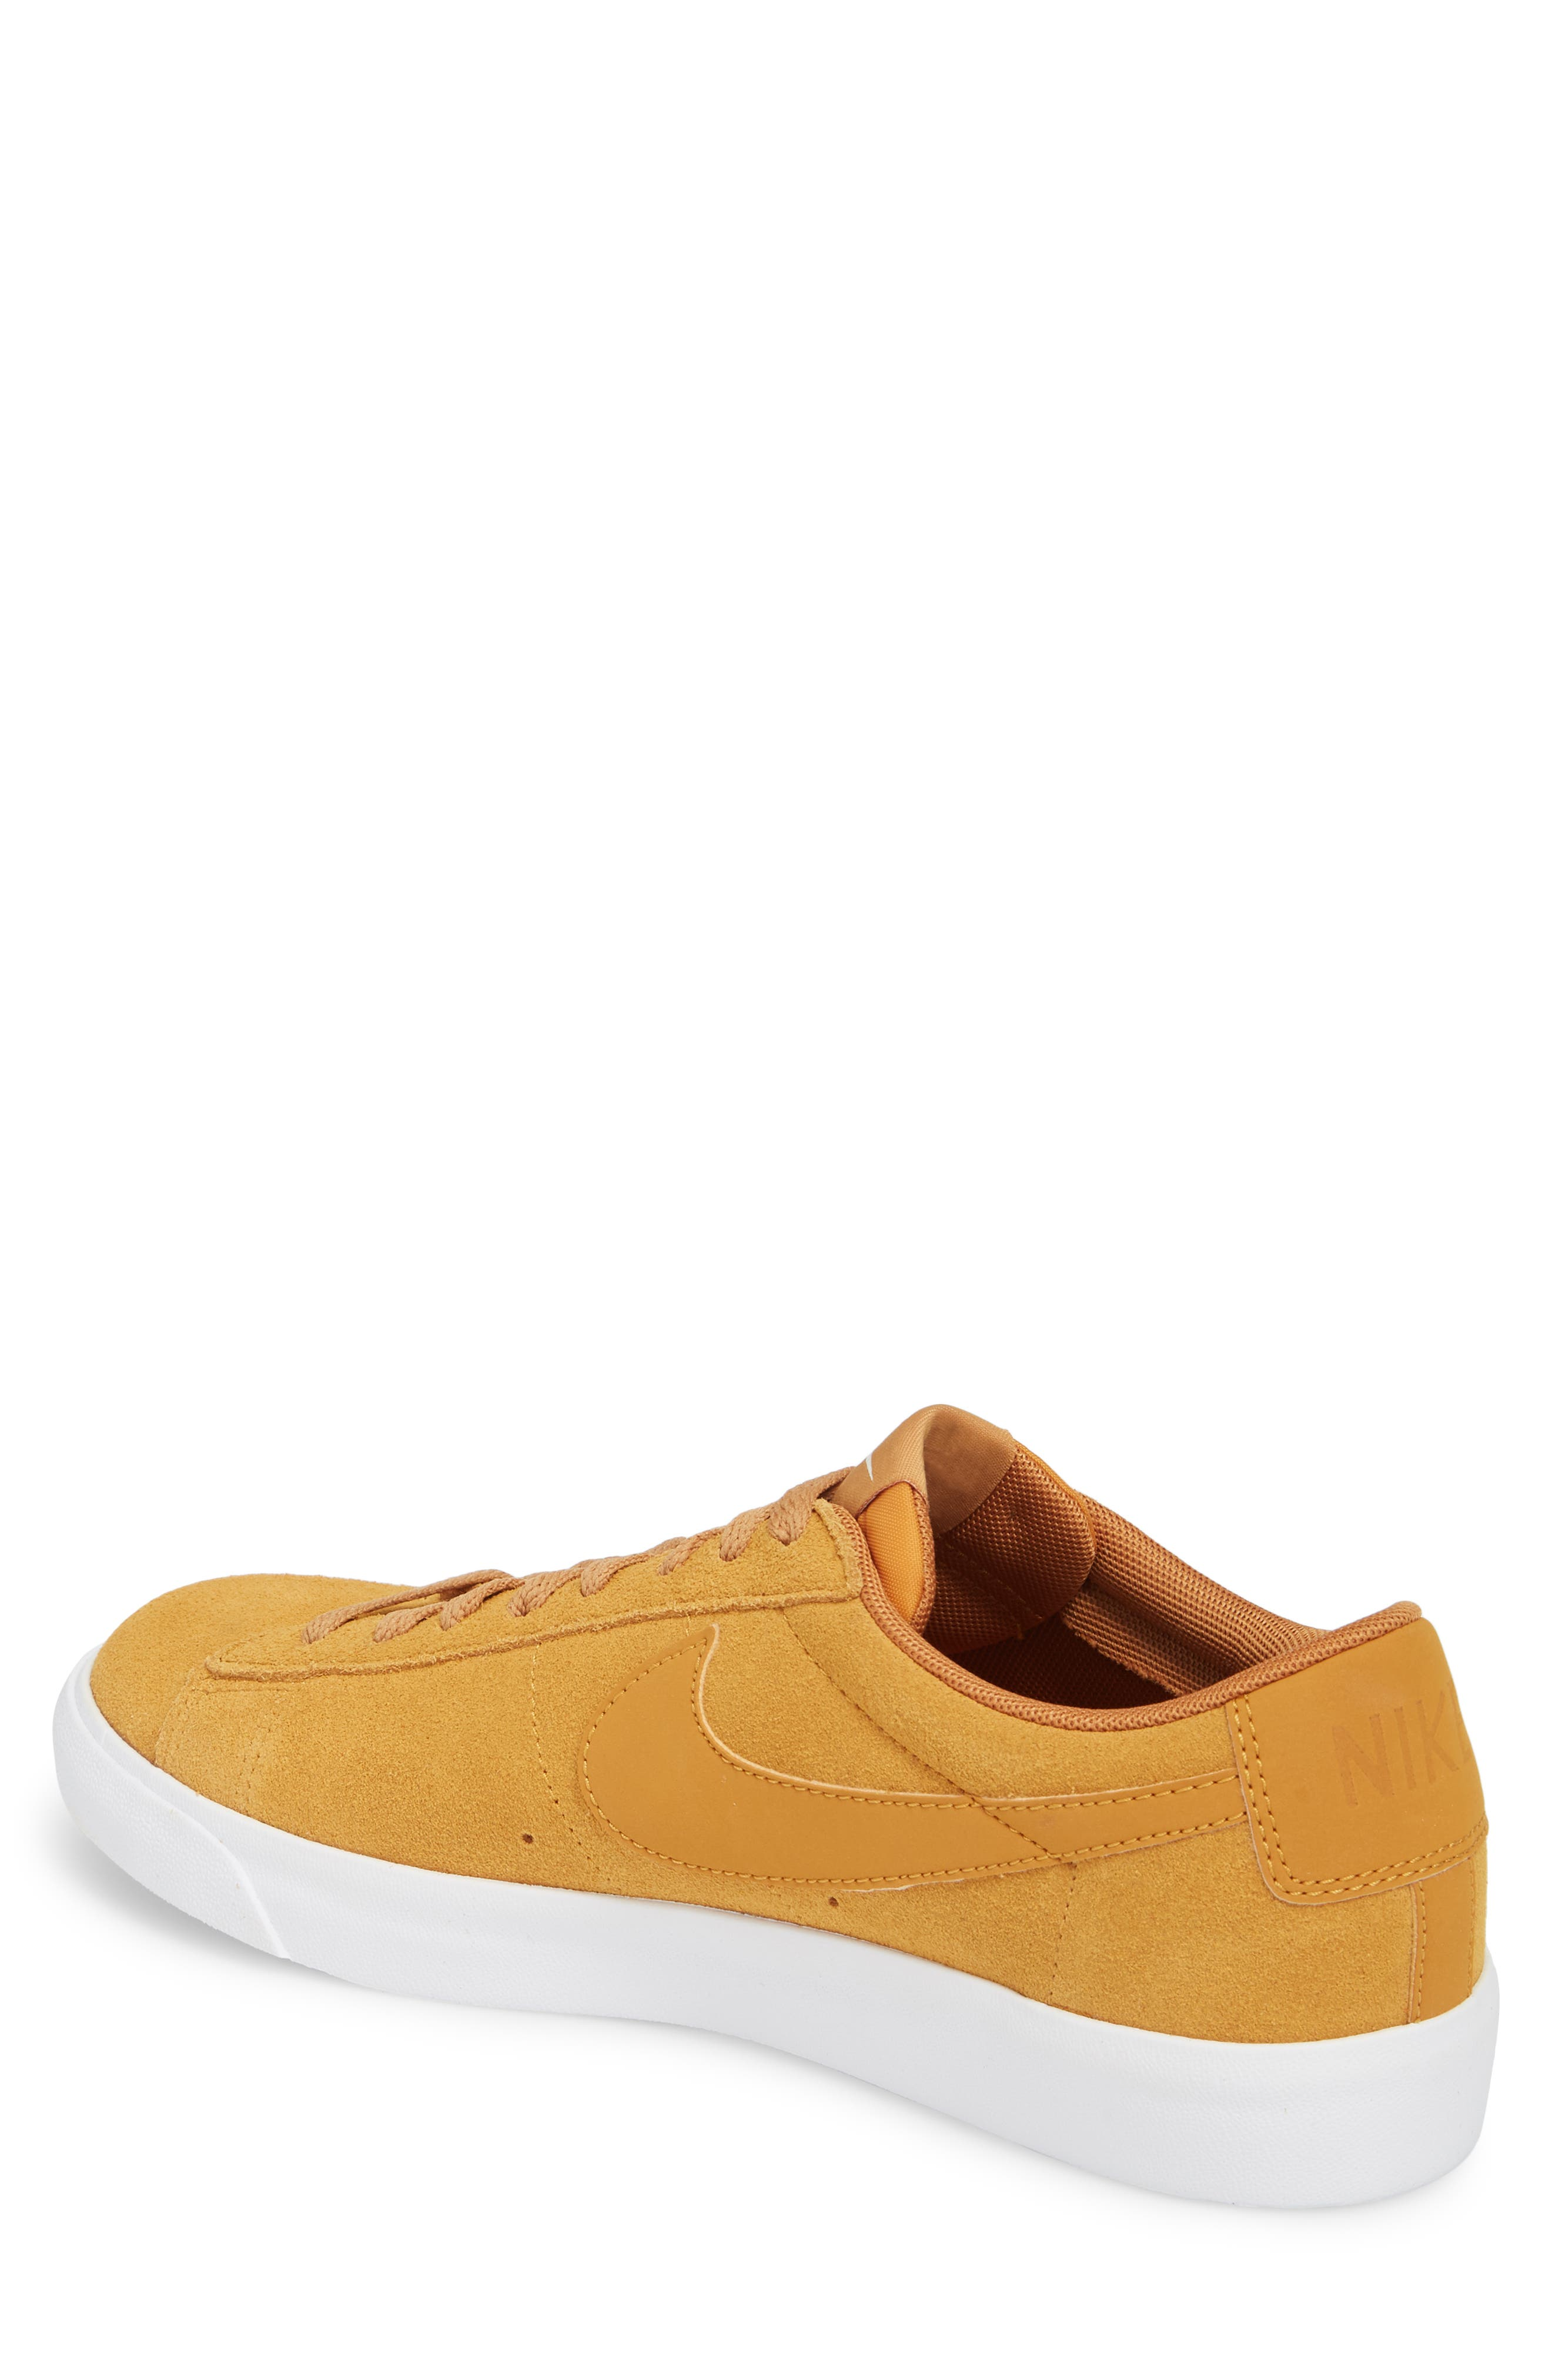 Blazer Low Suede Sneaker,                             Alternate thumbnail 2, color,                             260